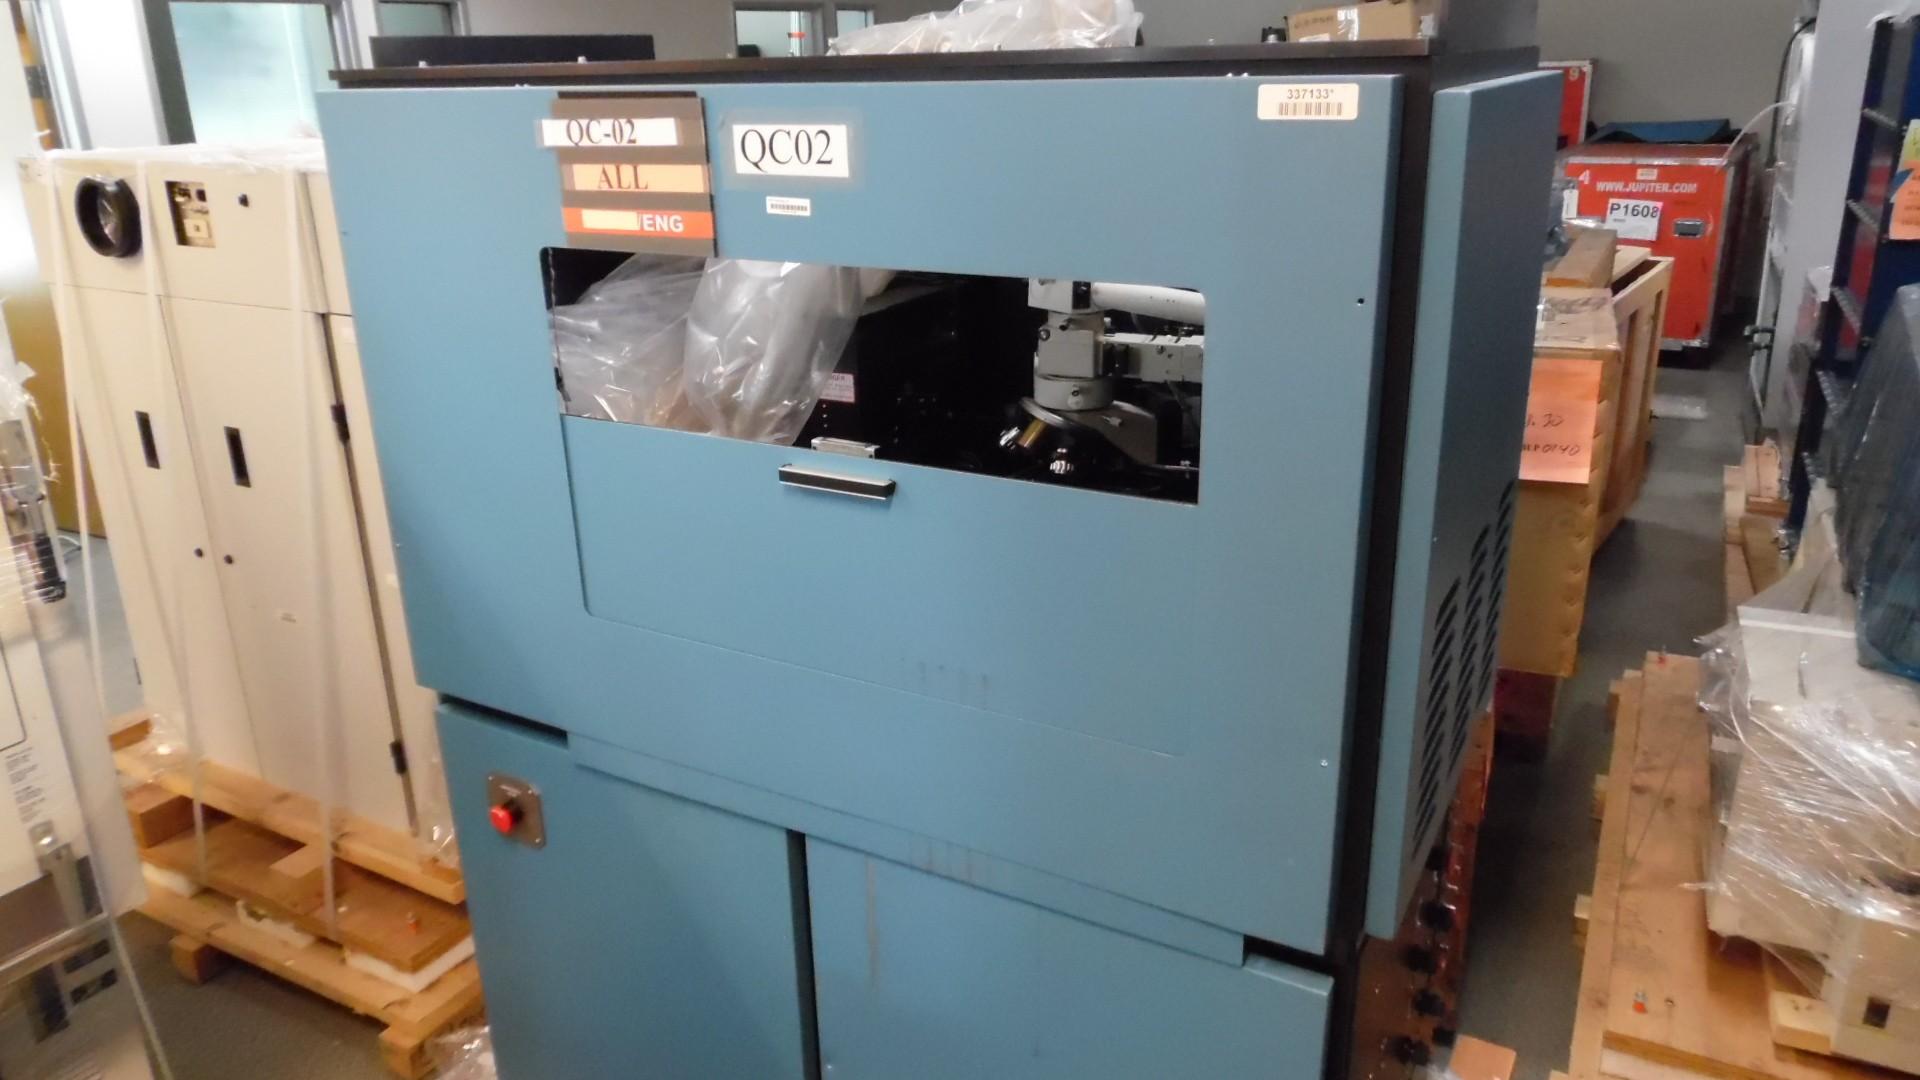 QC Optics D7000, Platter Inspection System, ULWD50, ULWD20, IC10, IC5